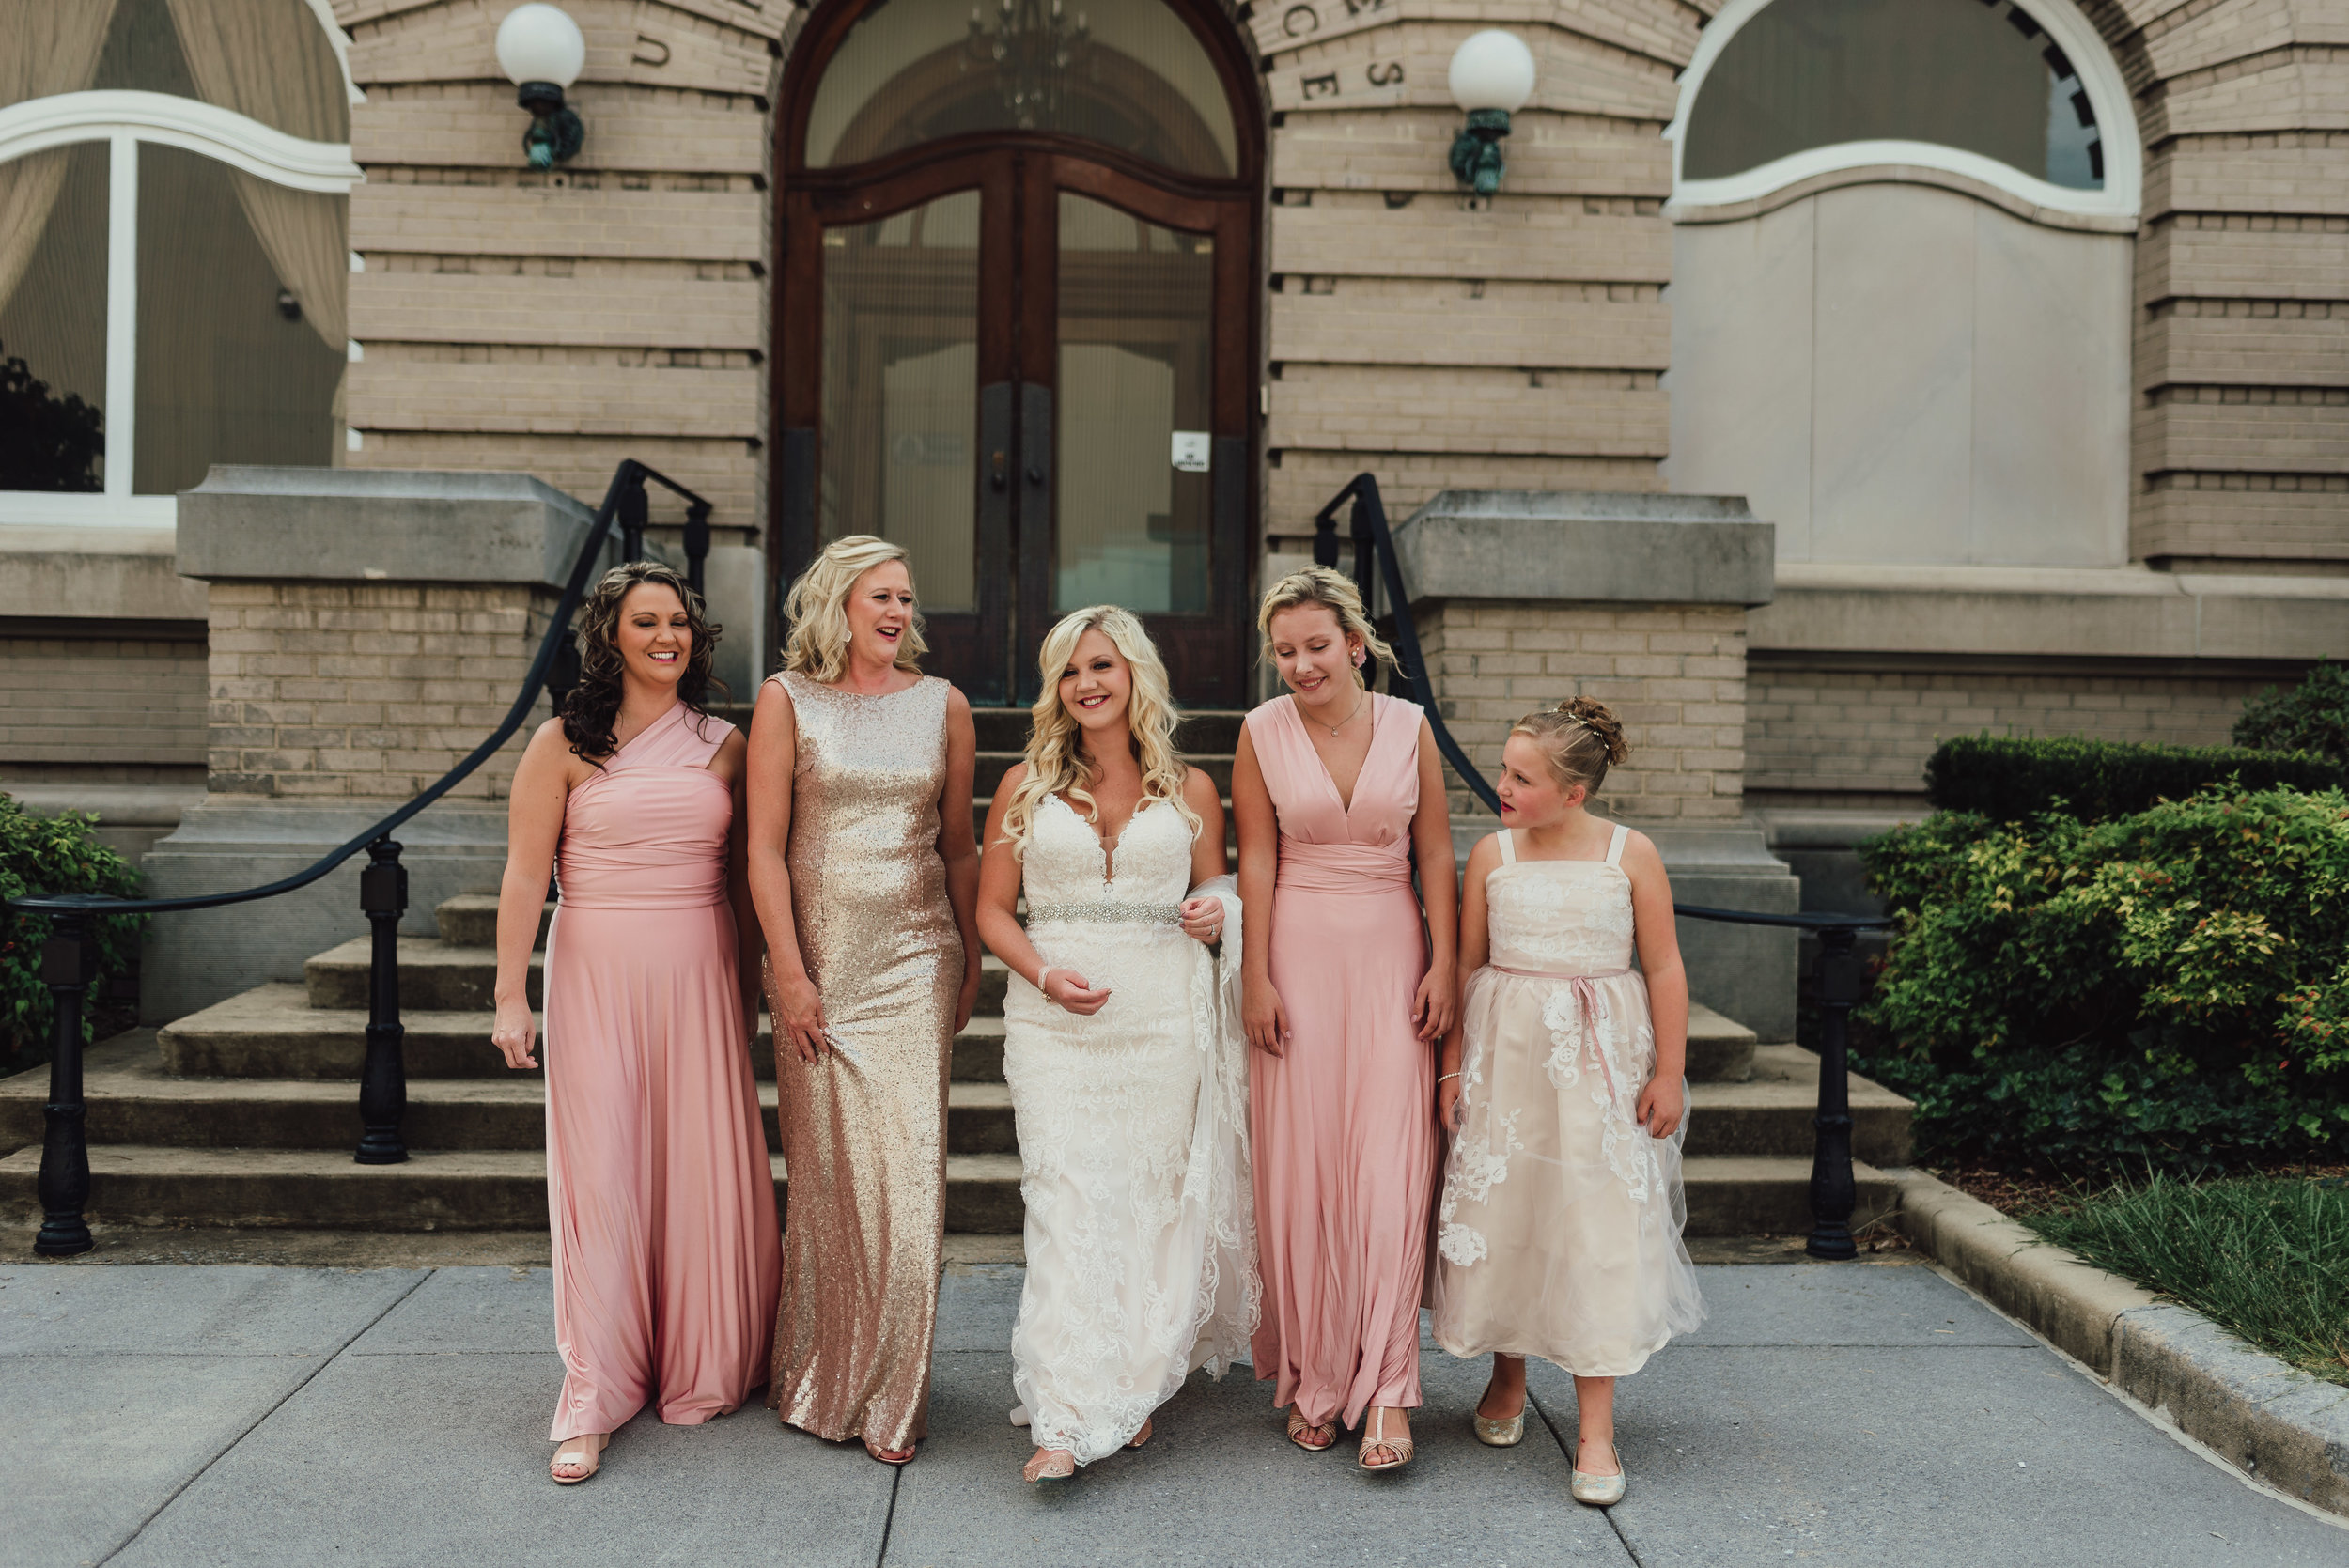 east-tn-wedding-photographer-tennessee-elopement-photographer-kingsport-tn-wedding-photographer (305 of 1001).jpg